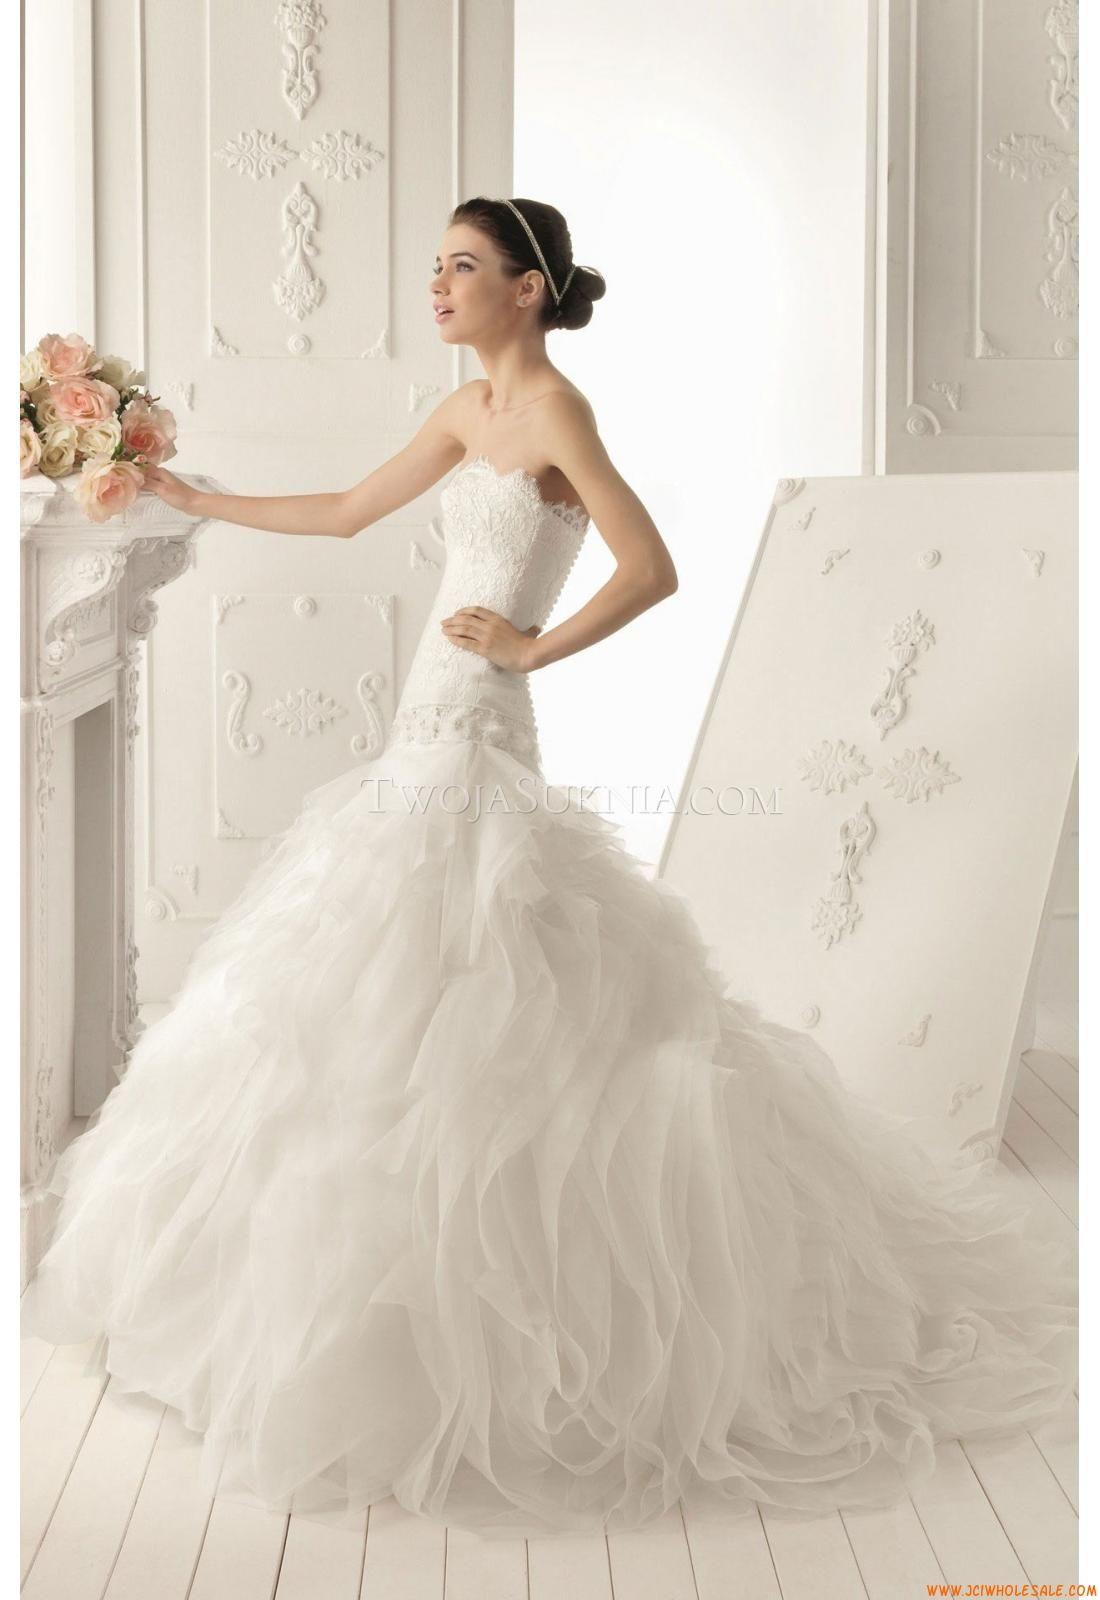 Aire barcelona wedding dresses  Robe de mariée Aire Barcelona  Rumor   Robe de mariée Aire